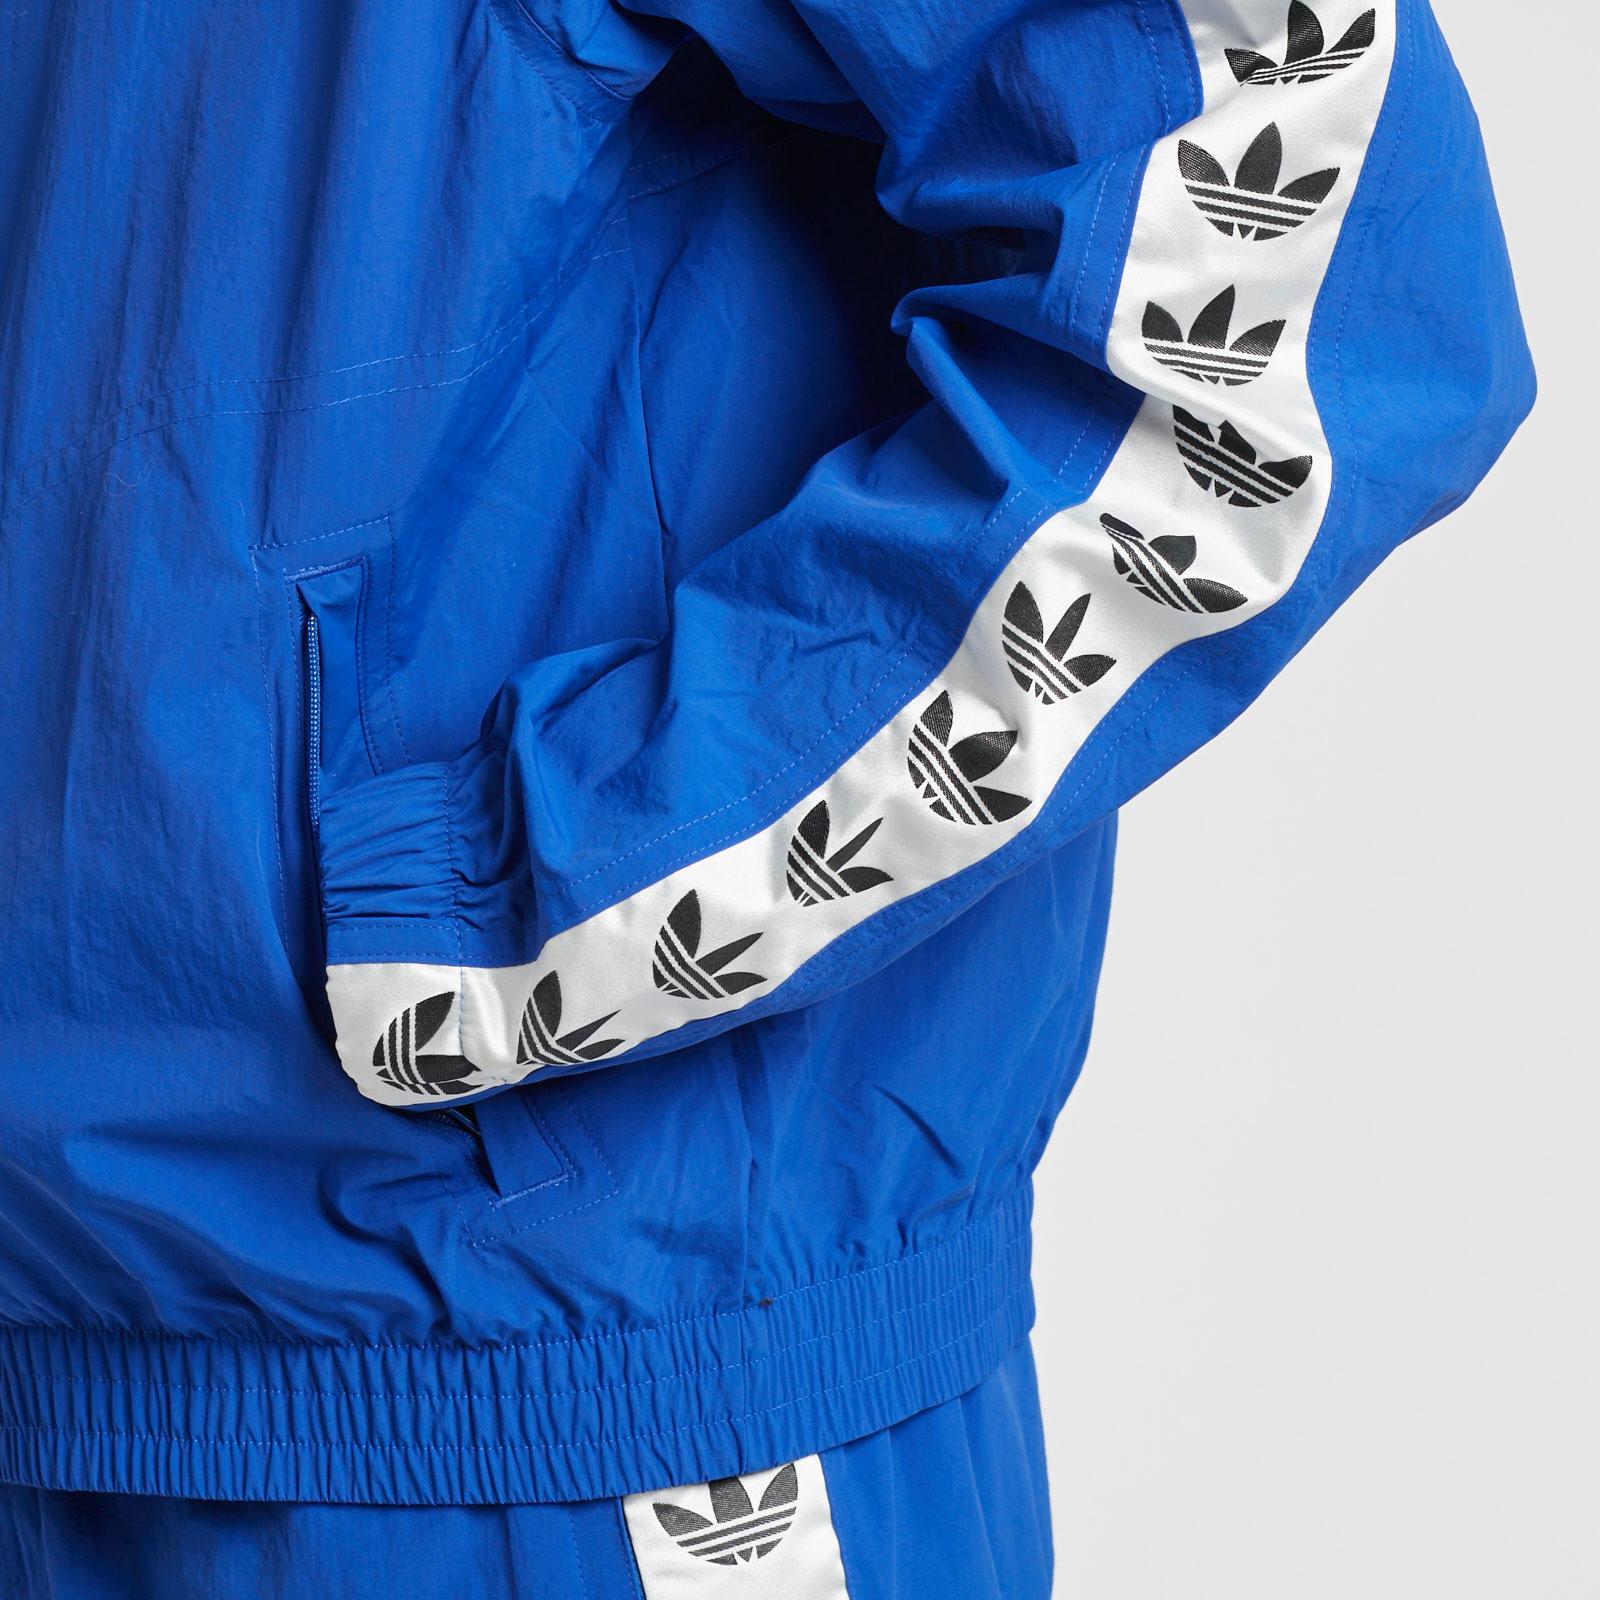 Araña de tela en embudo Conclusión reserva  adidas Tnt Wind Top - Ce4826 - Sneakersnstuff | sneakers & streetwear  online since 1999